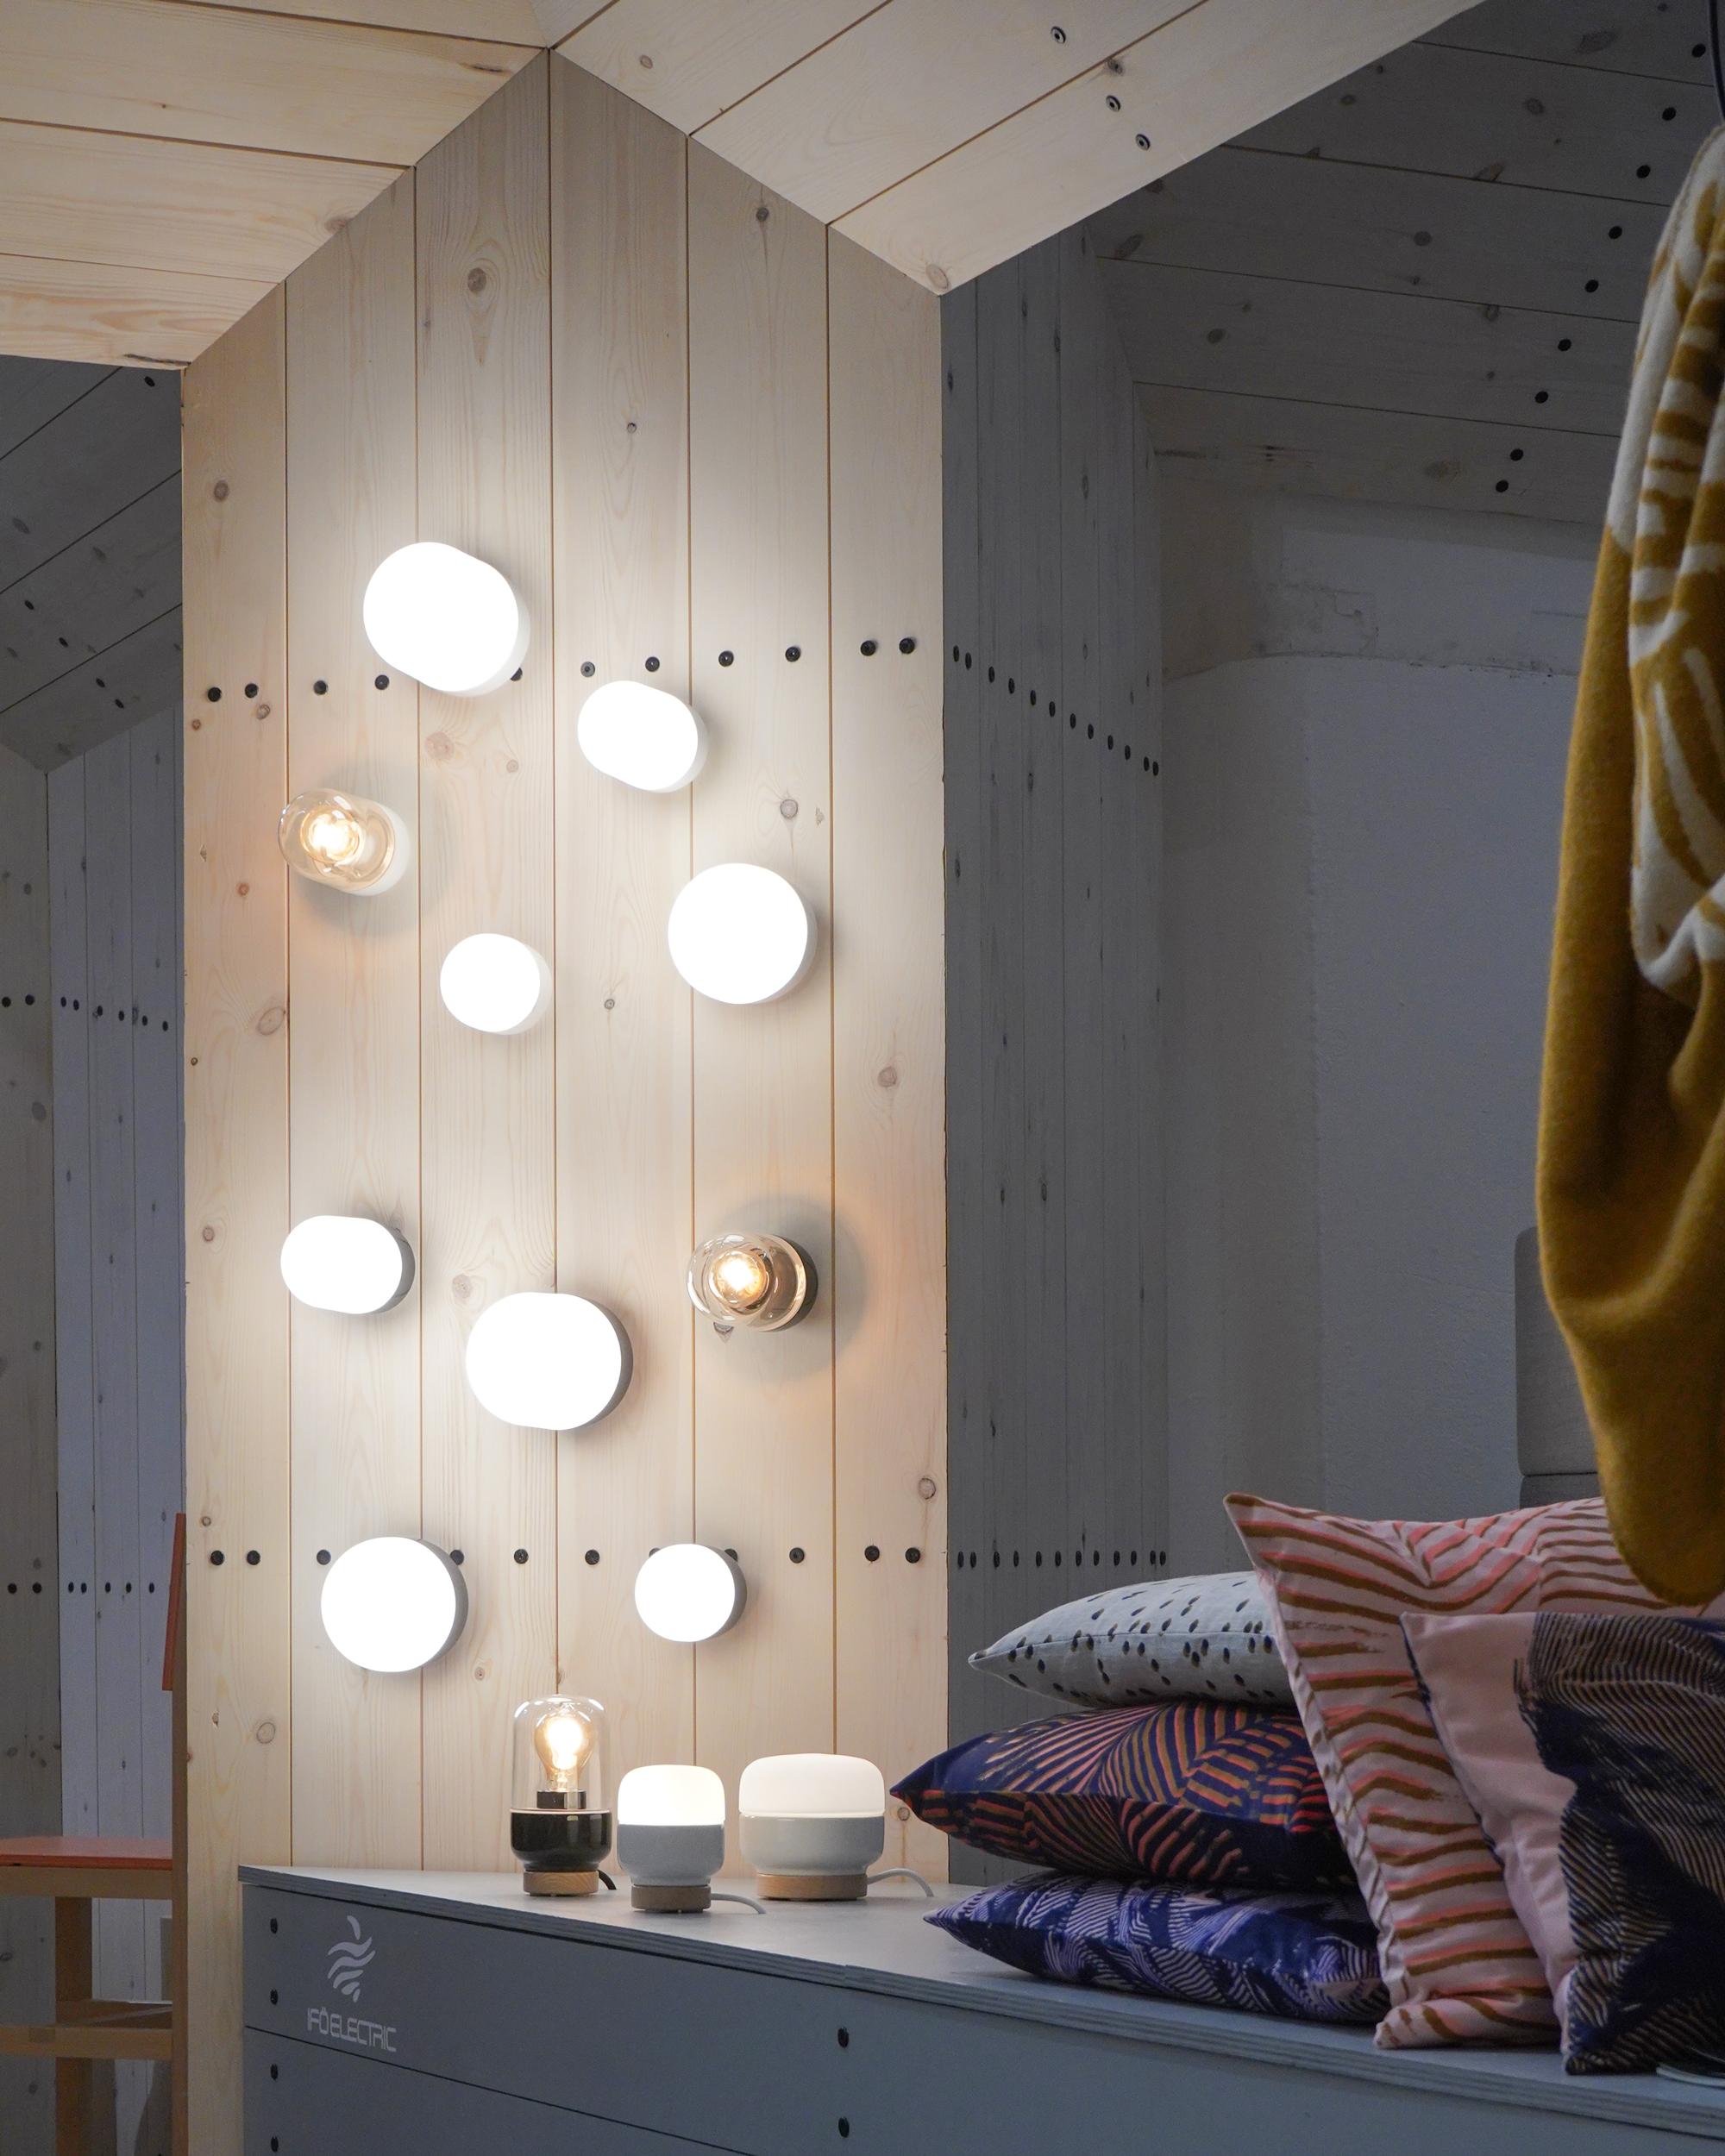 Ohm by Ifö Electric - Designed by Kauppi & Kauppi - Swedish Design Pavilion - London Design Fair 2019 - .jpg